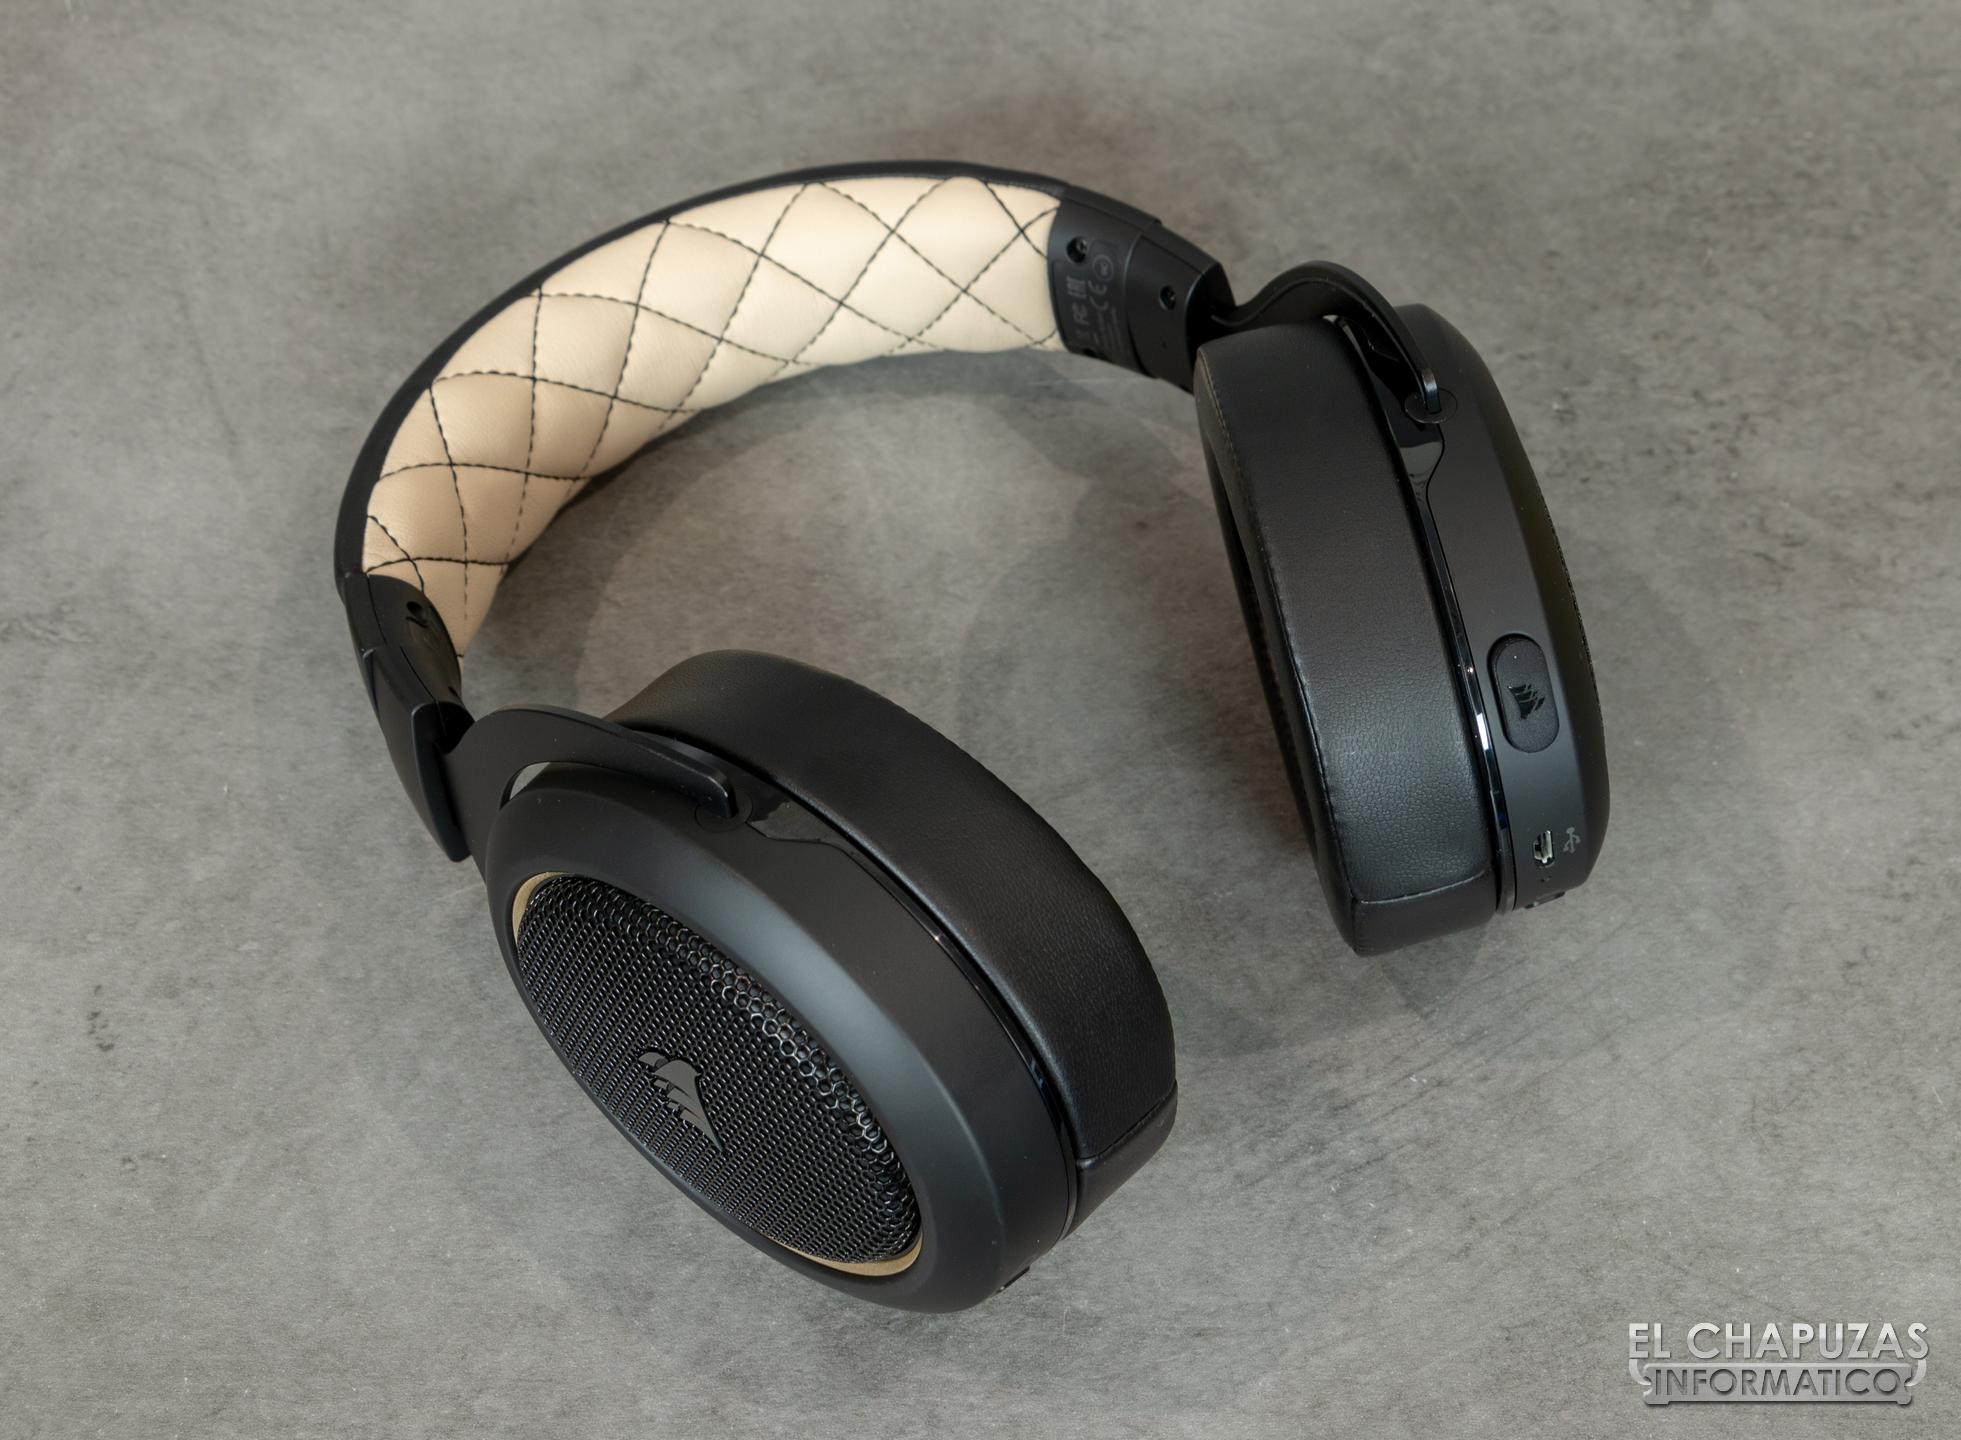 Review: Corsair HS70 Pro Wireless